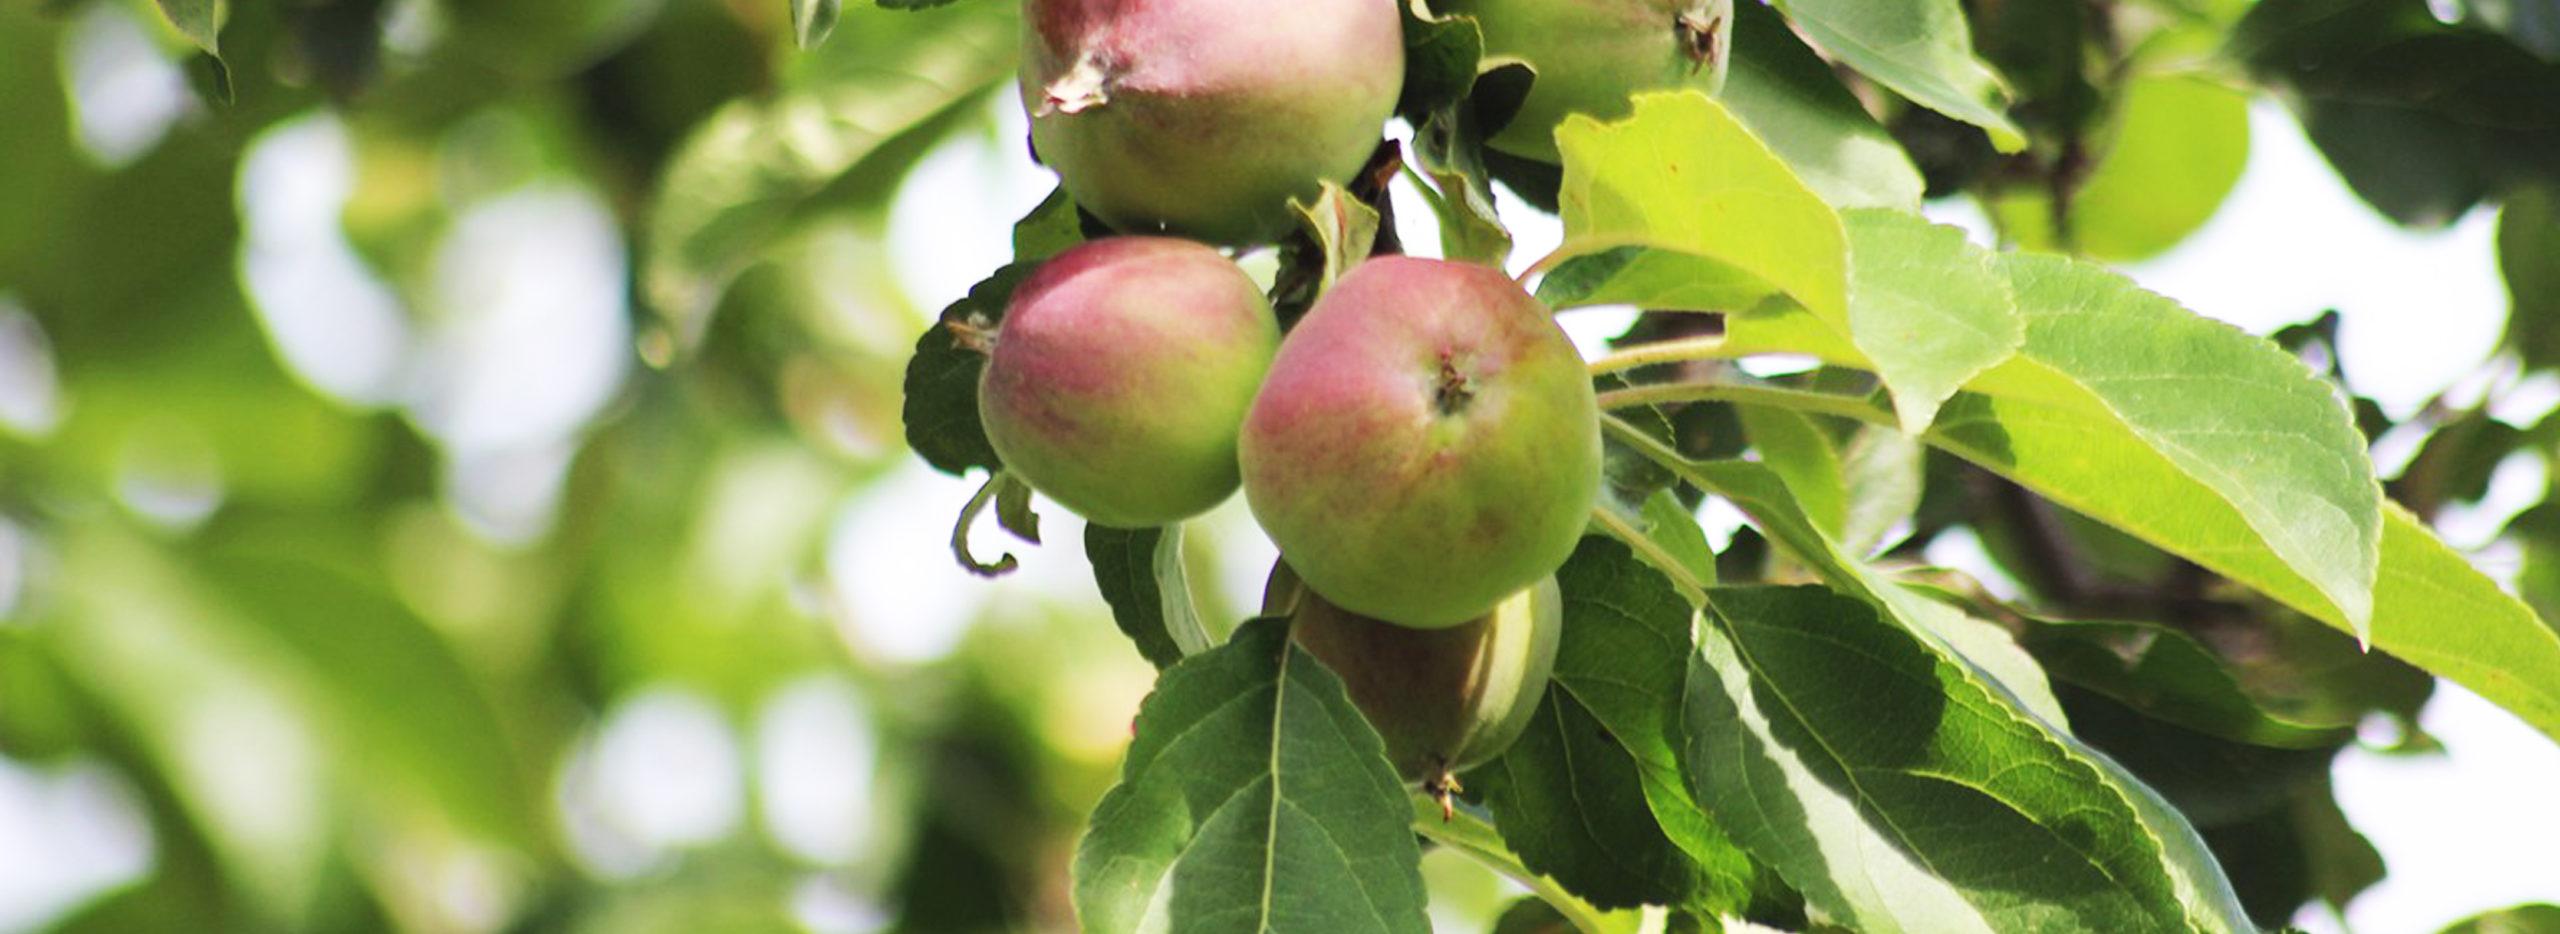 Äpfel am Apfelbaum